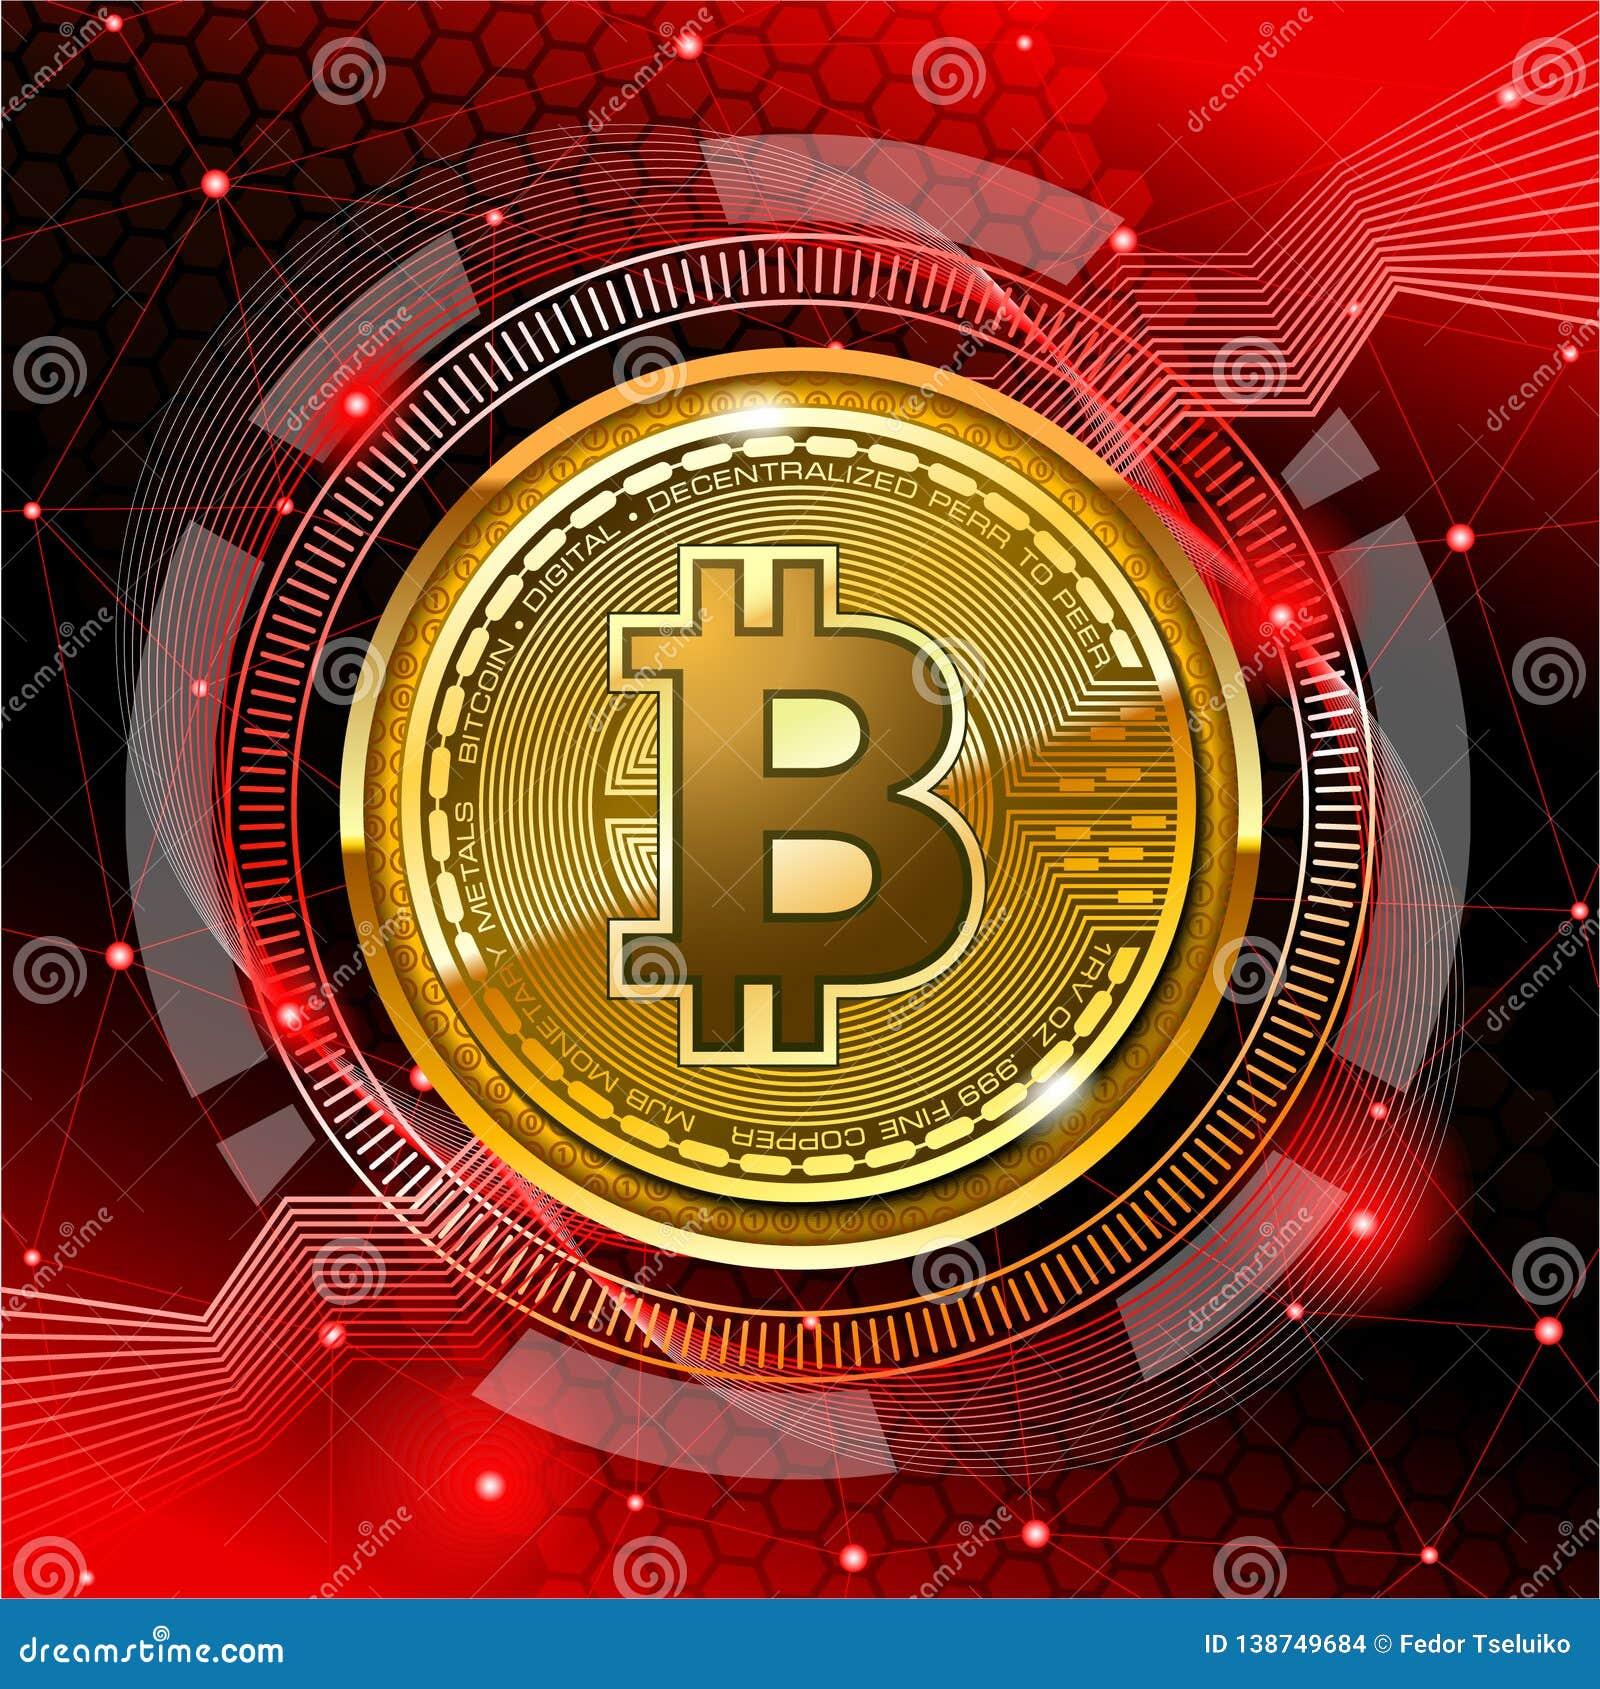 digital currency bitcoin